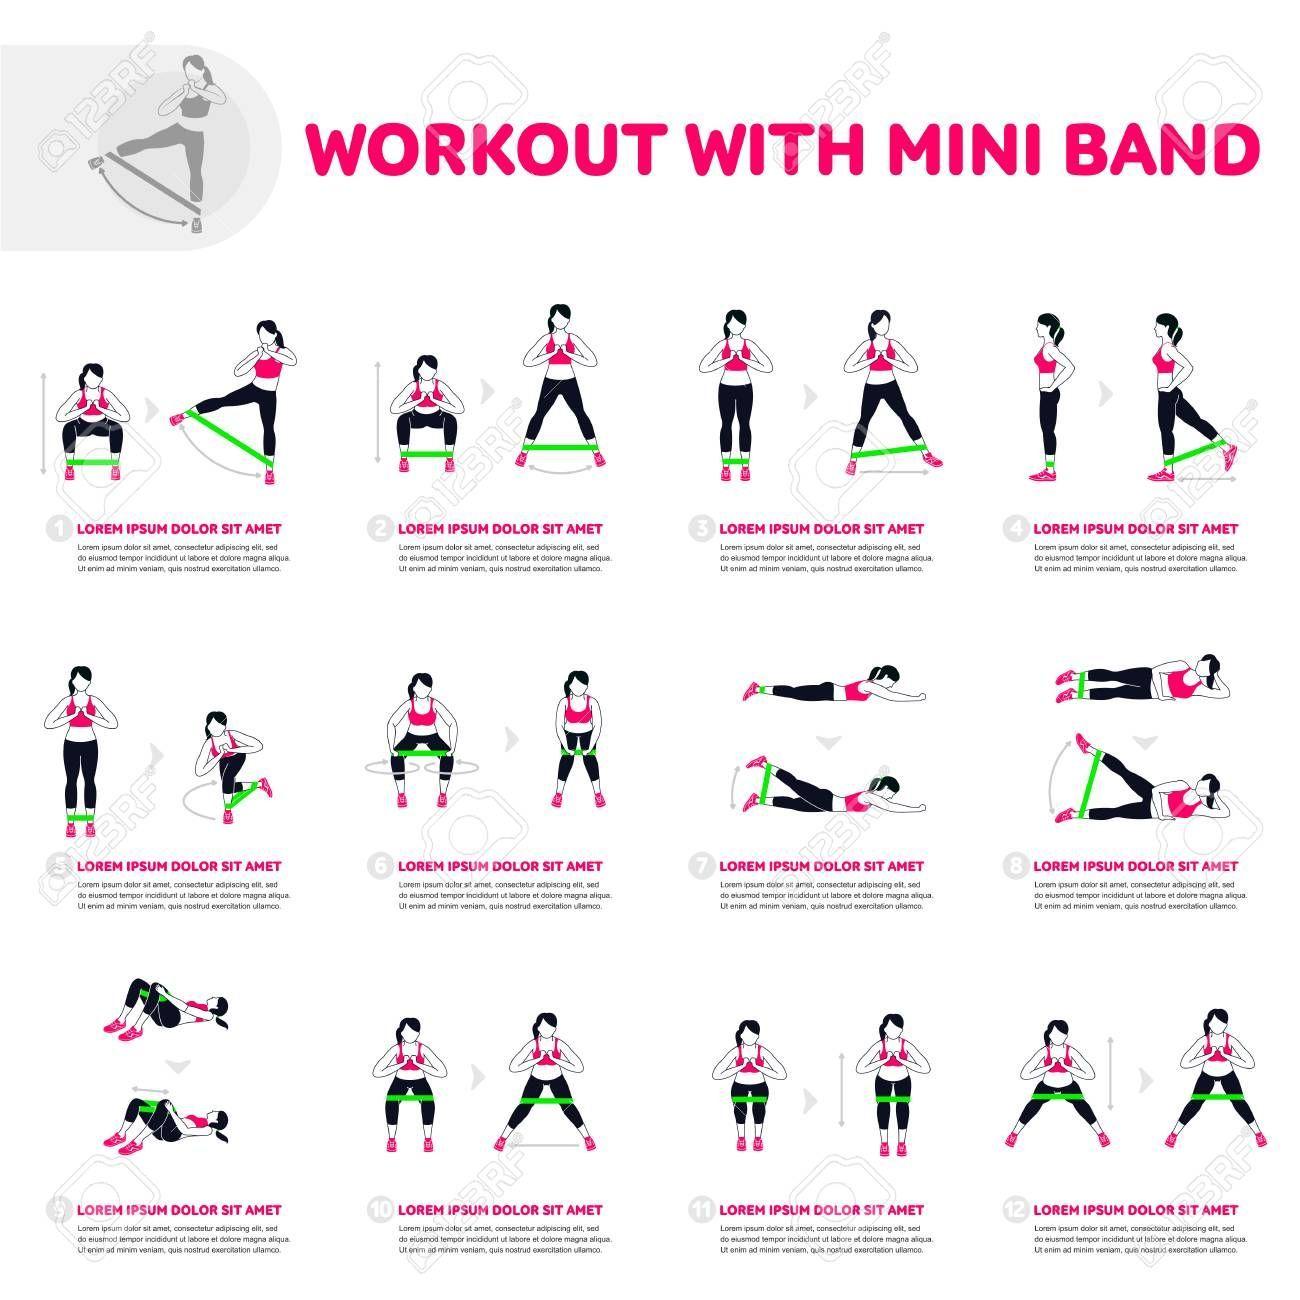 Training mit Miniband. Fitness, Aerobic ... - #Aerobic #Fitness #Miniband #mit #sport #Training